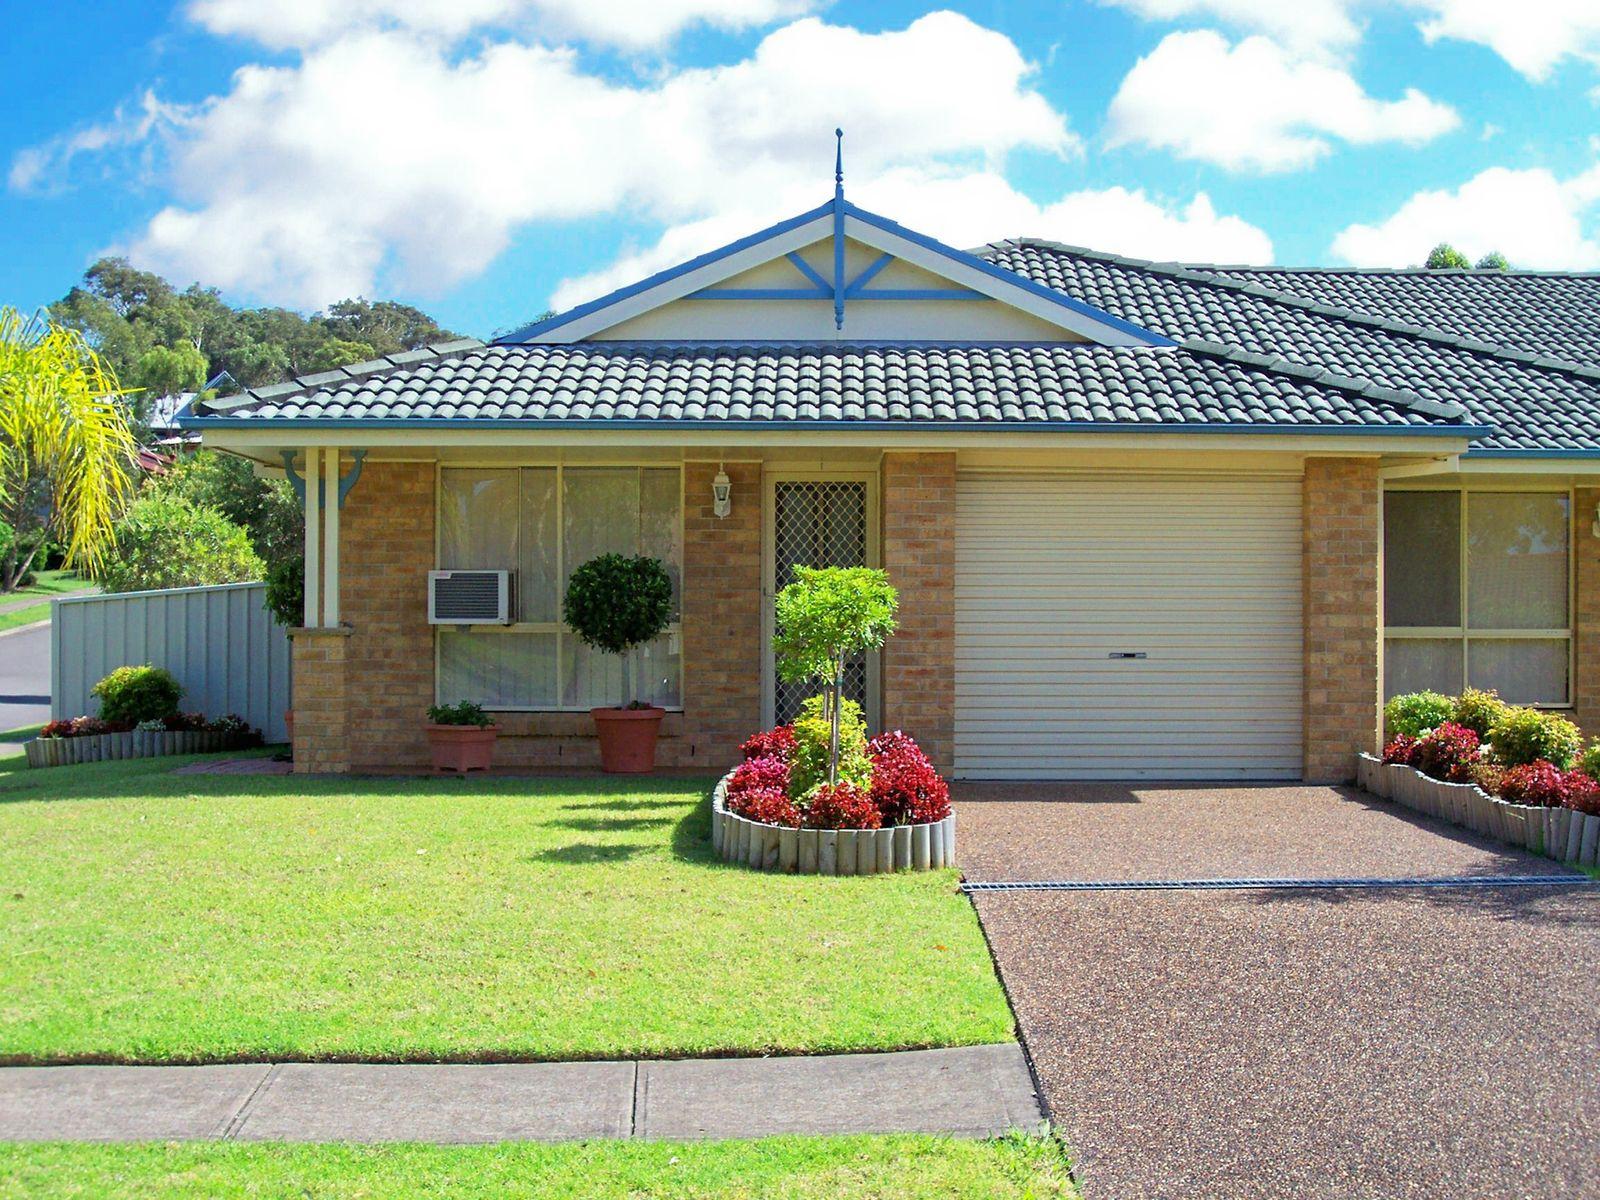 1/1 Baronet Close, Floraville, NSW 2280